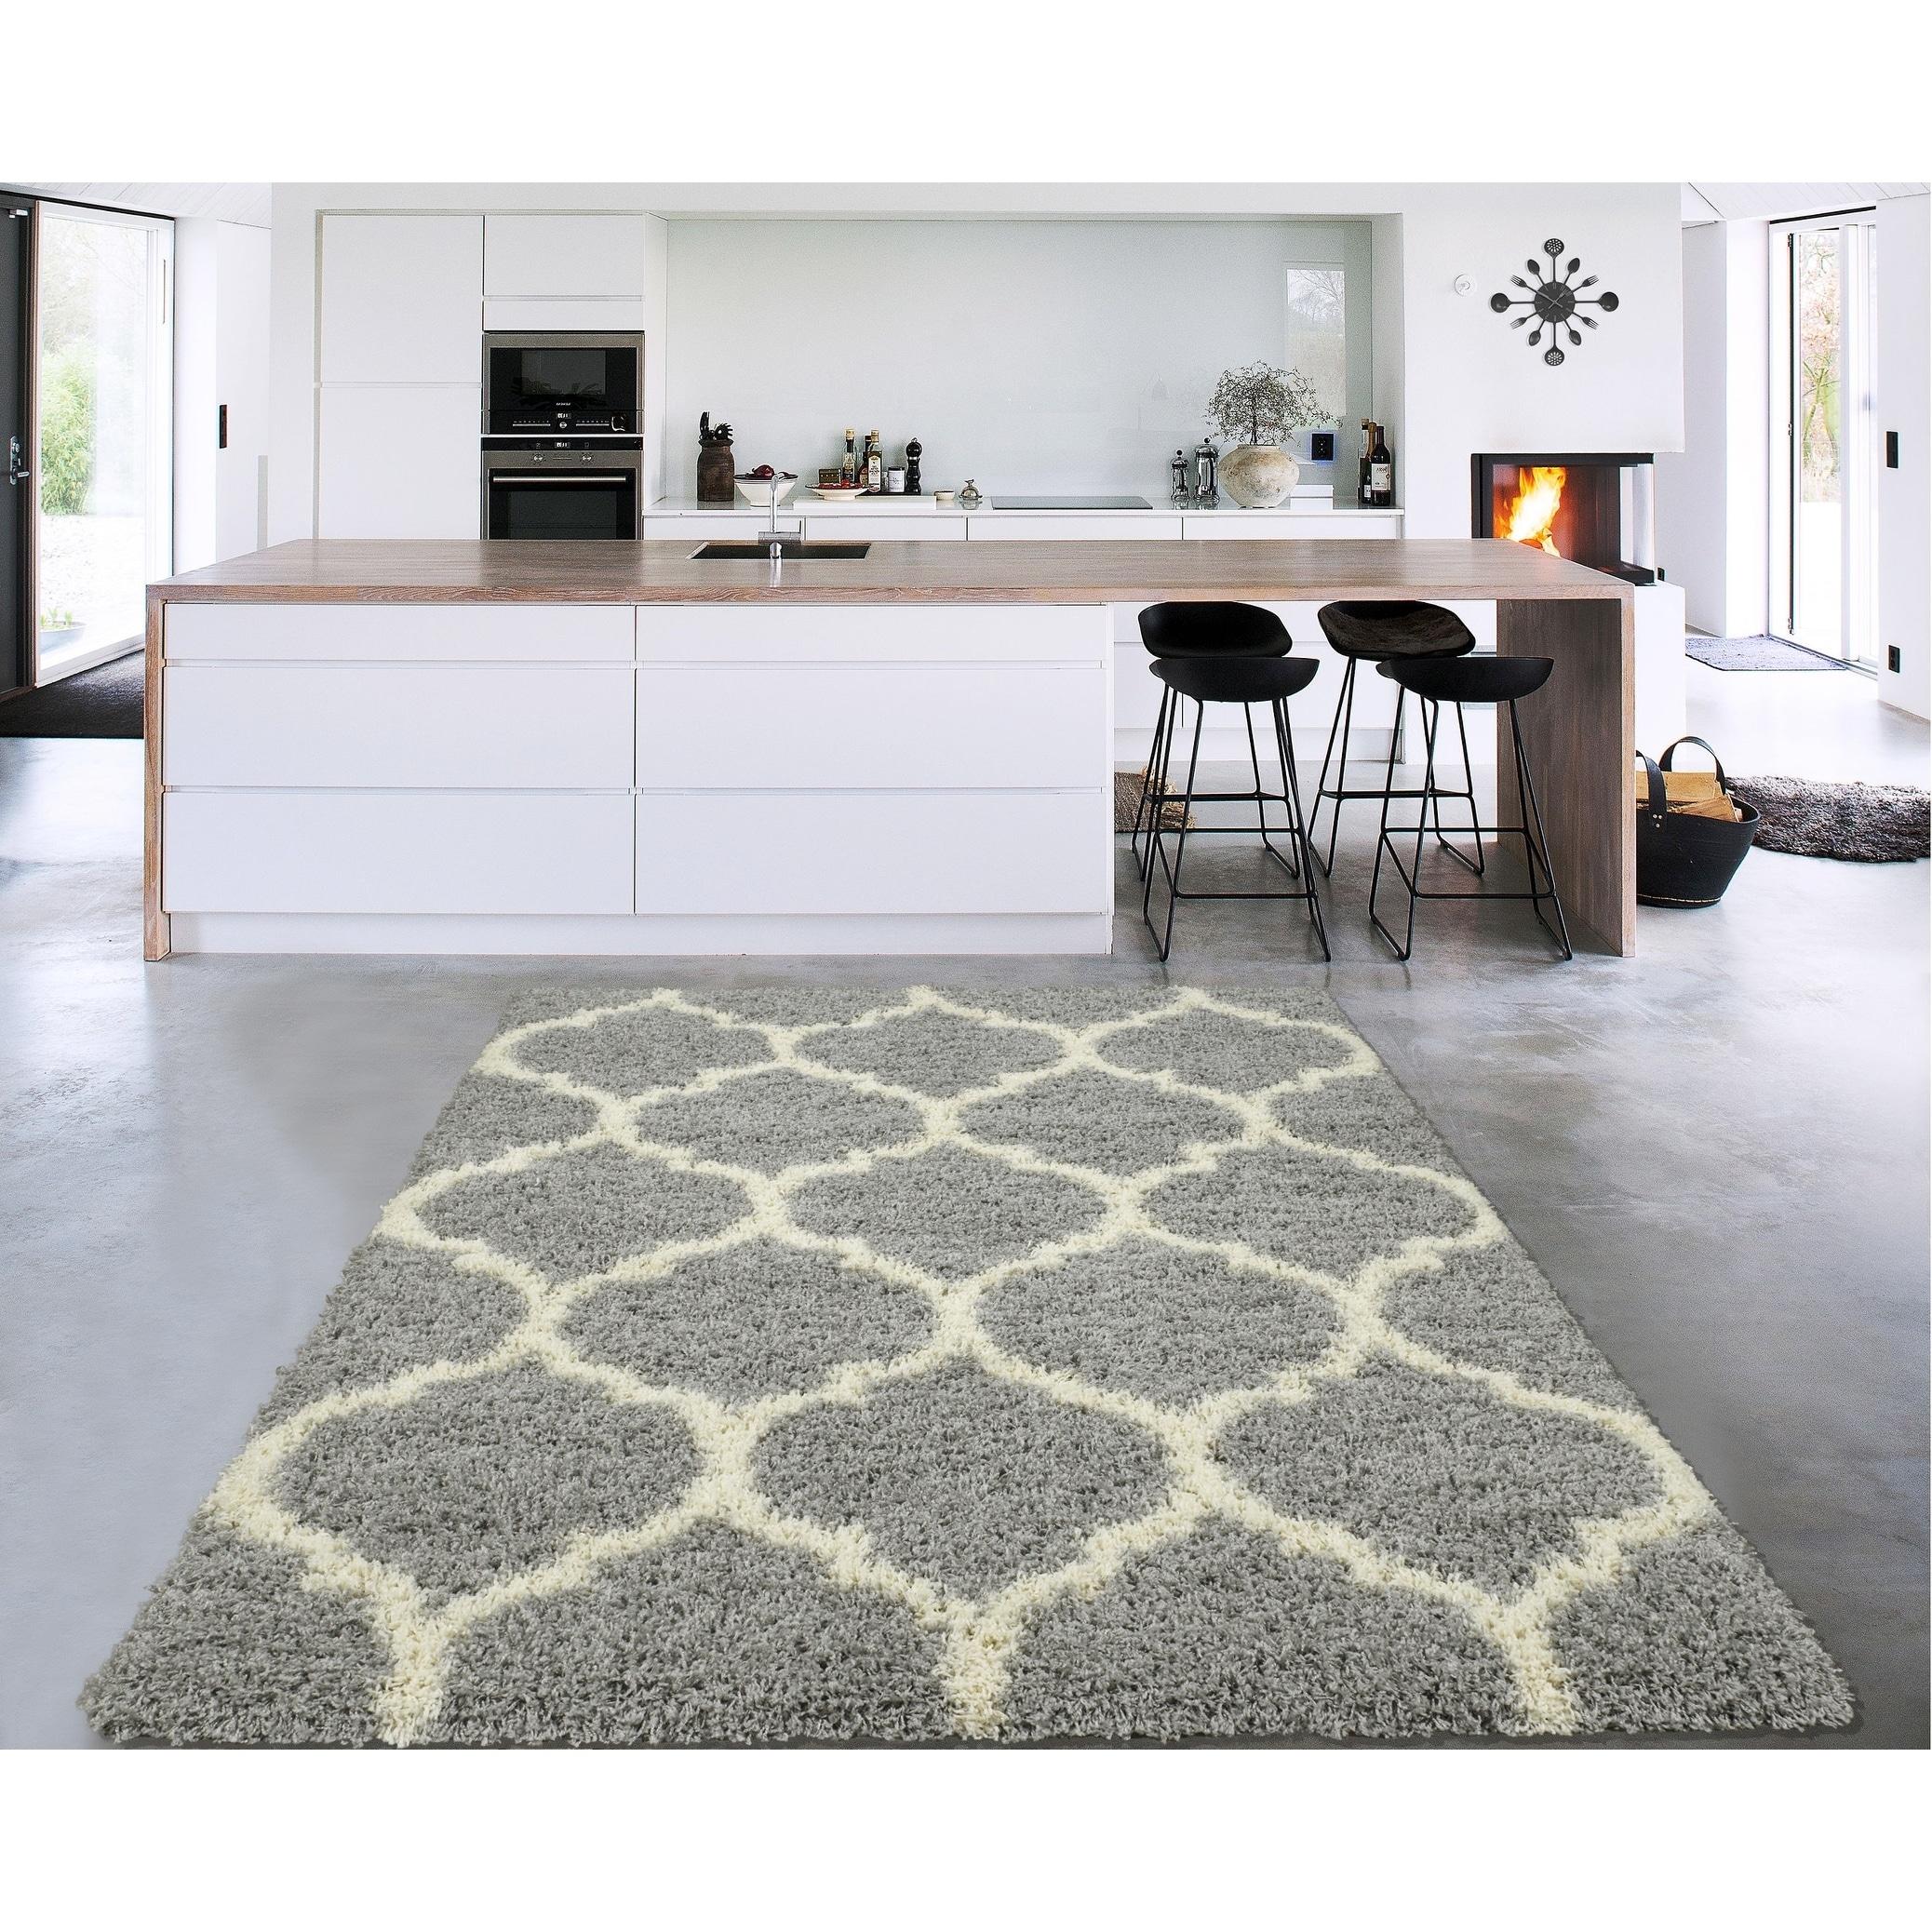 Sweethome Stores Cozy Trellis Design Shag Area Rug - 3\'3\